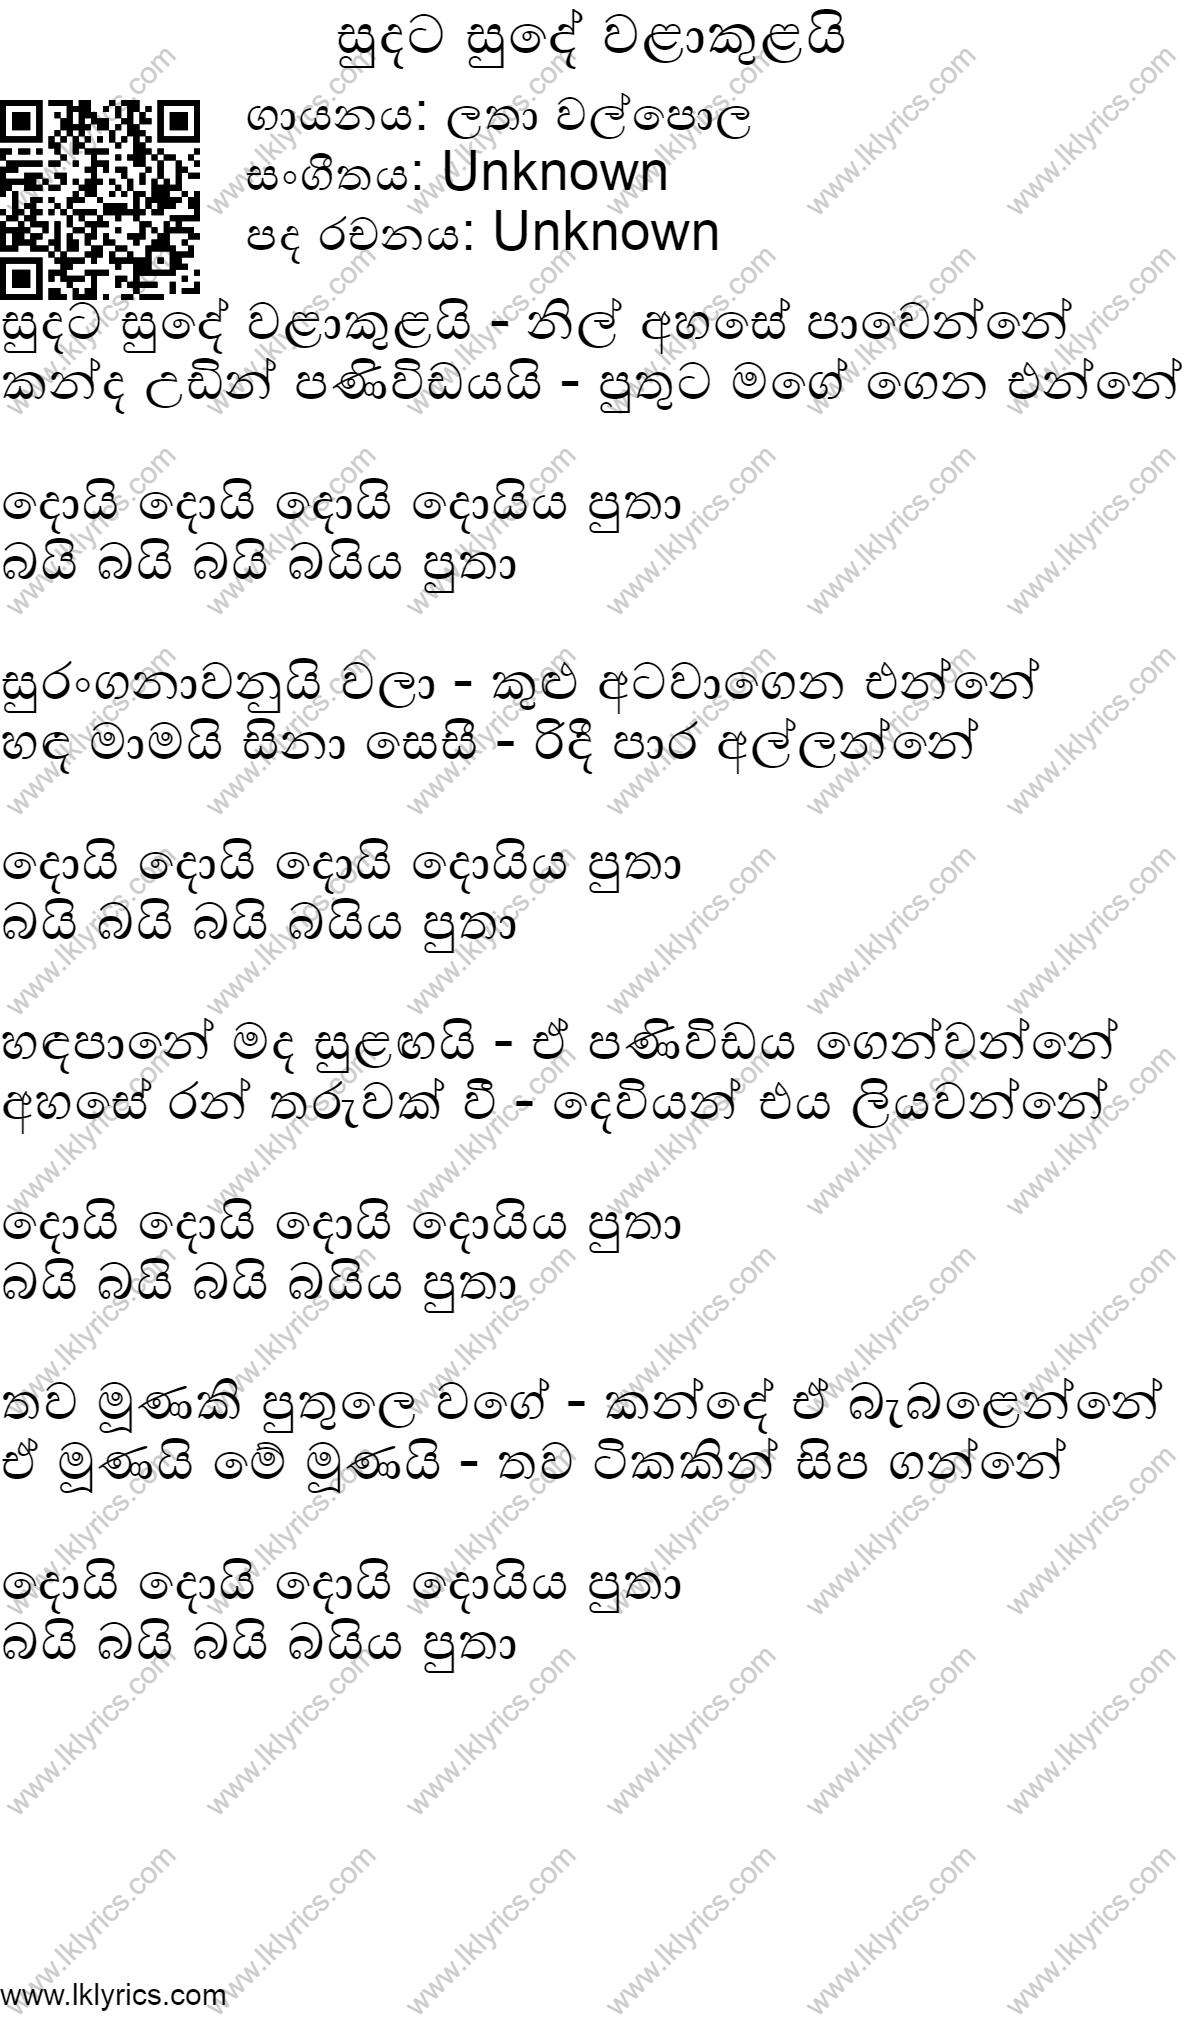 Sri lanaka nadee - 3 part 3